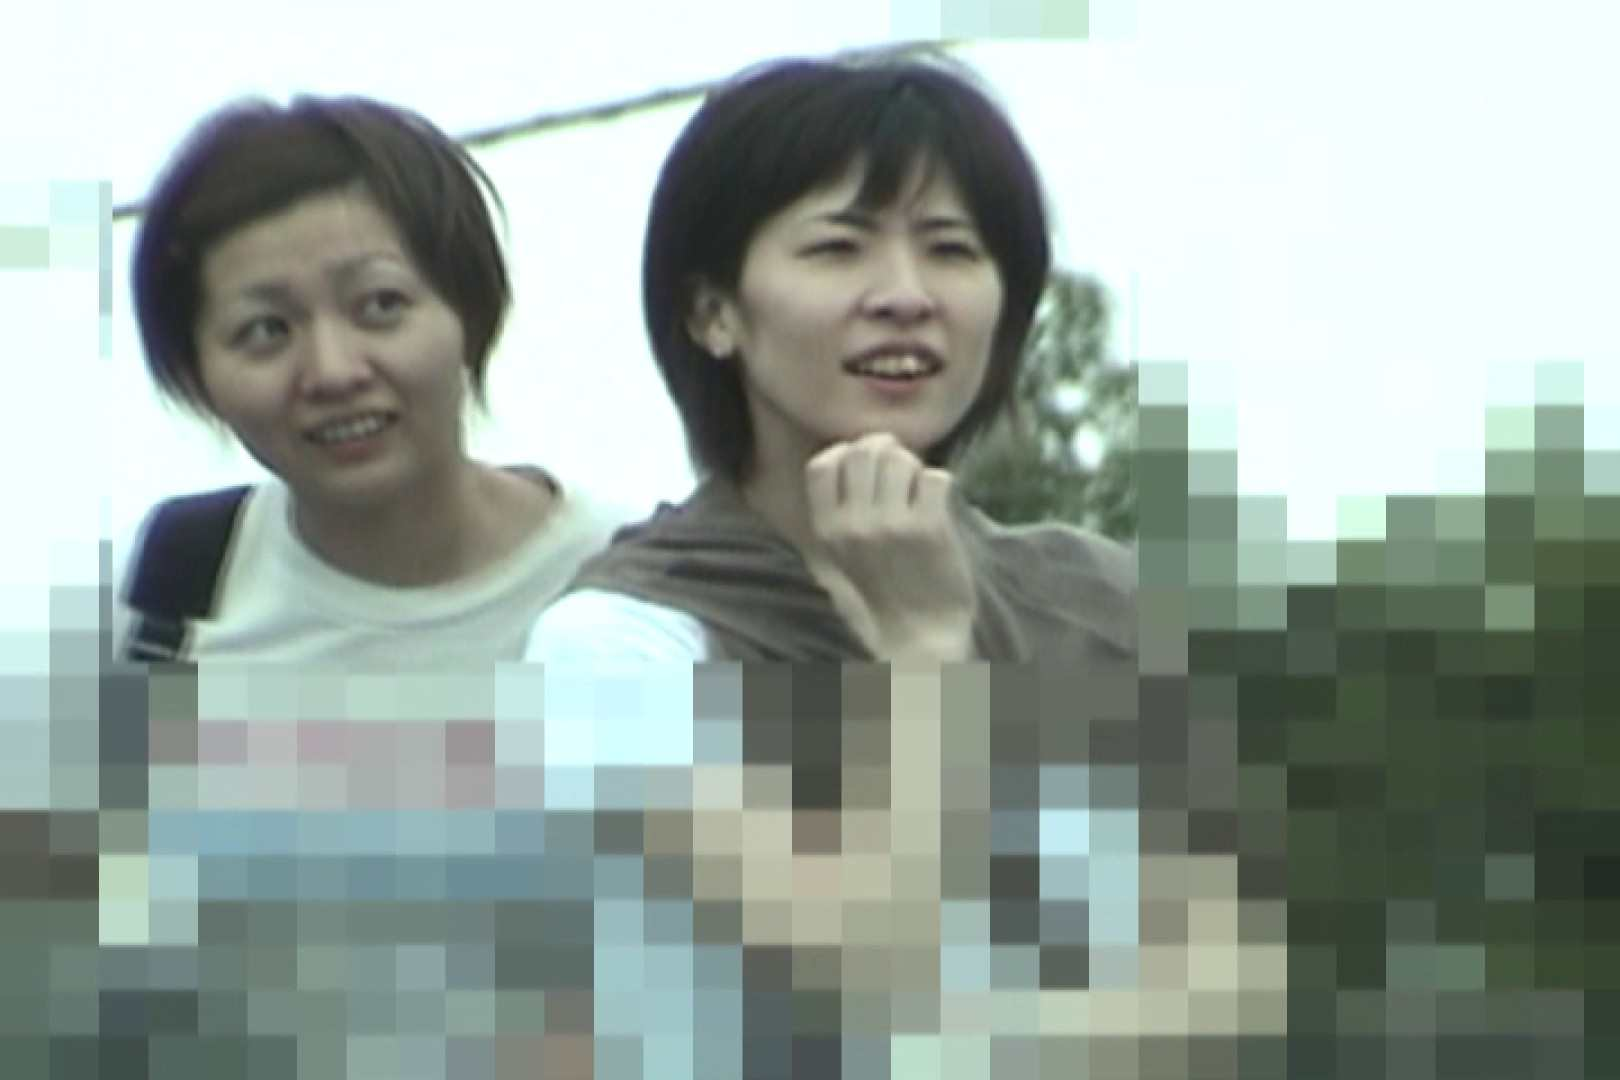 Aquaな露天風呂Vol.793 露天 | OLセックス  94画像 4